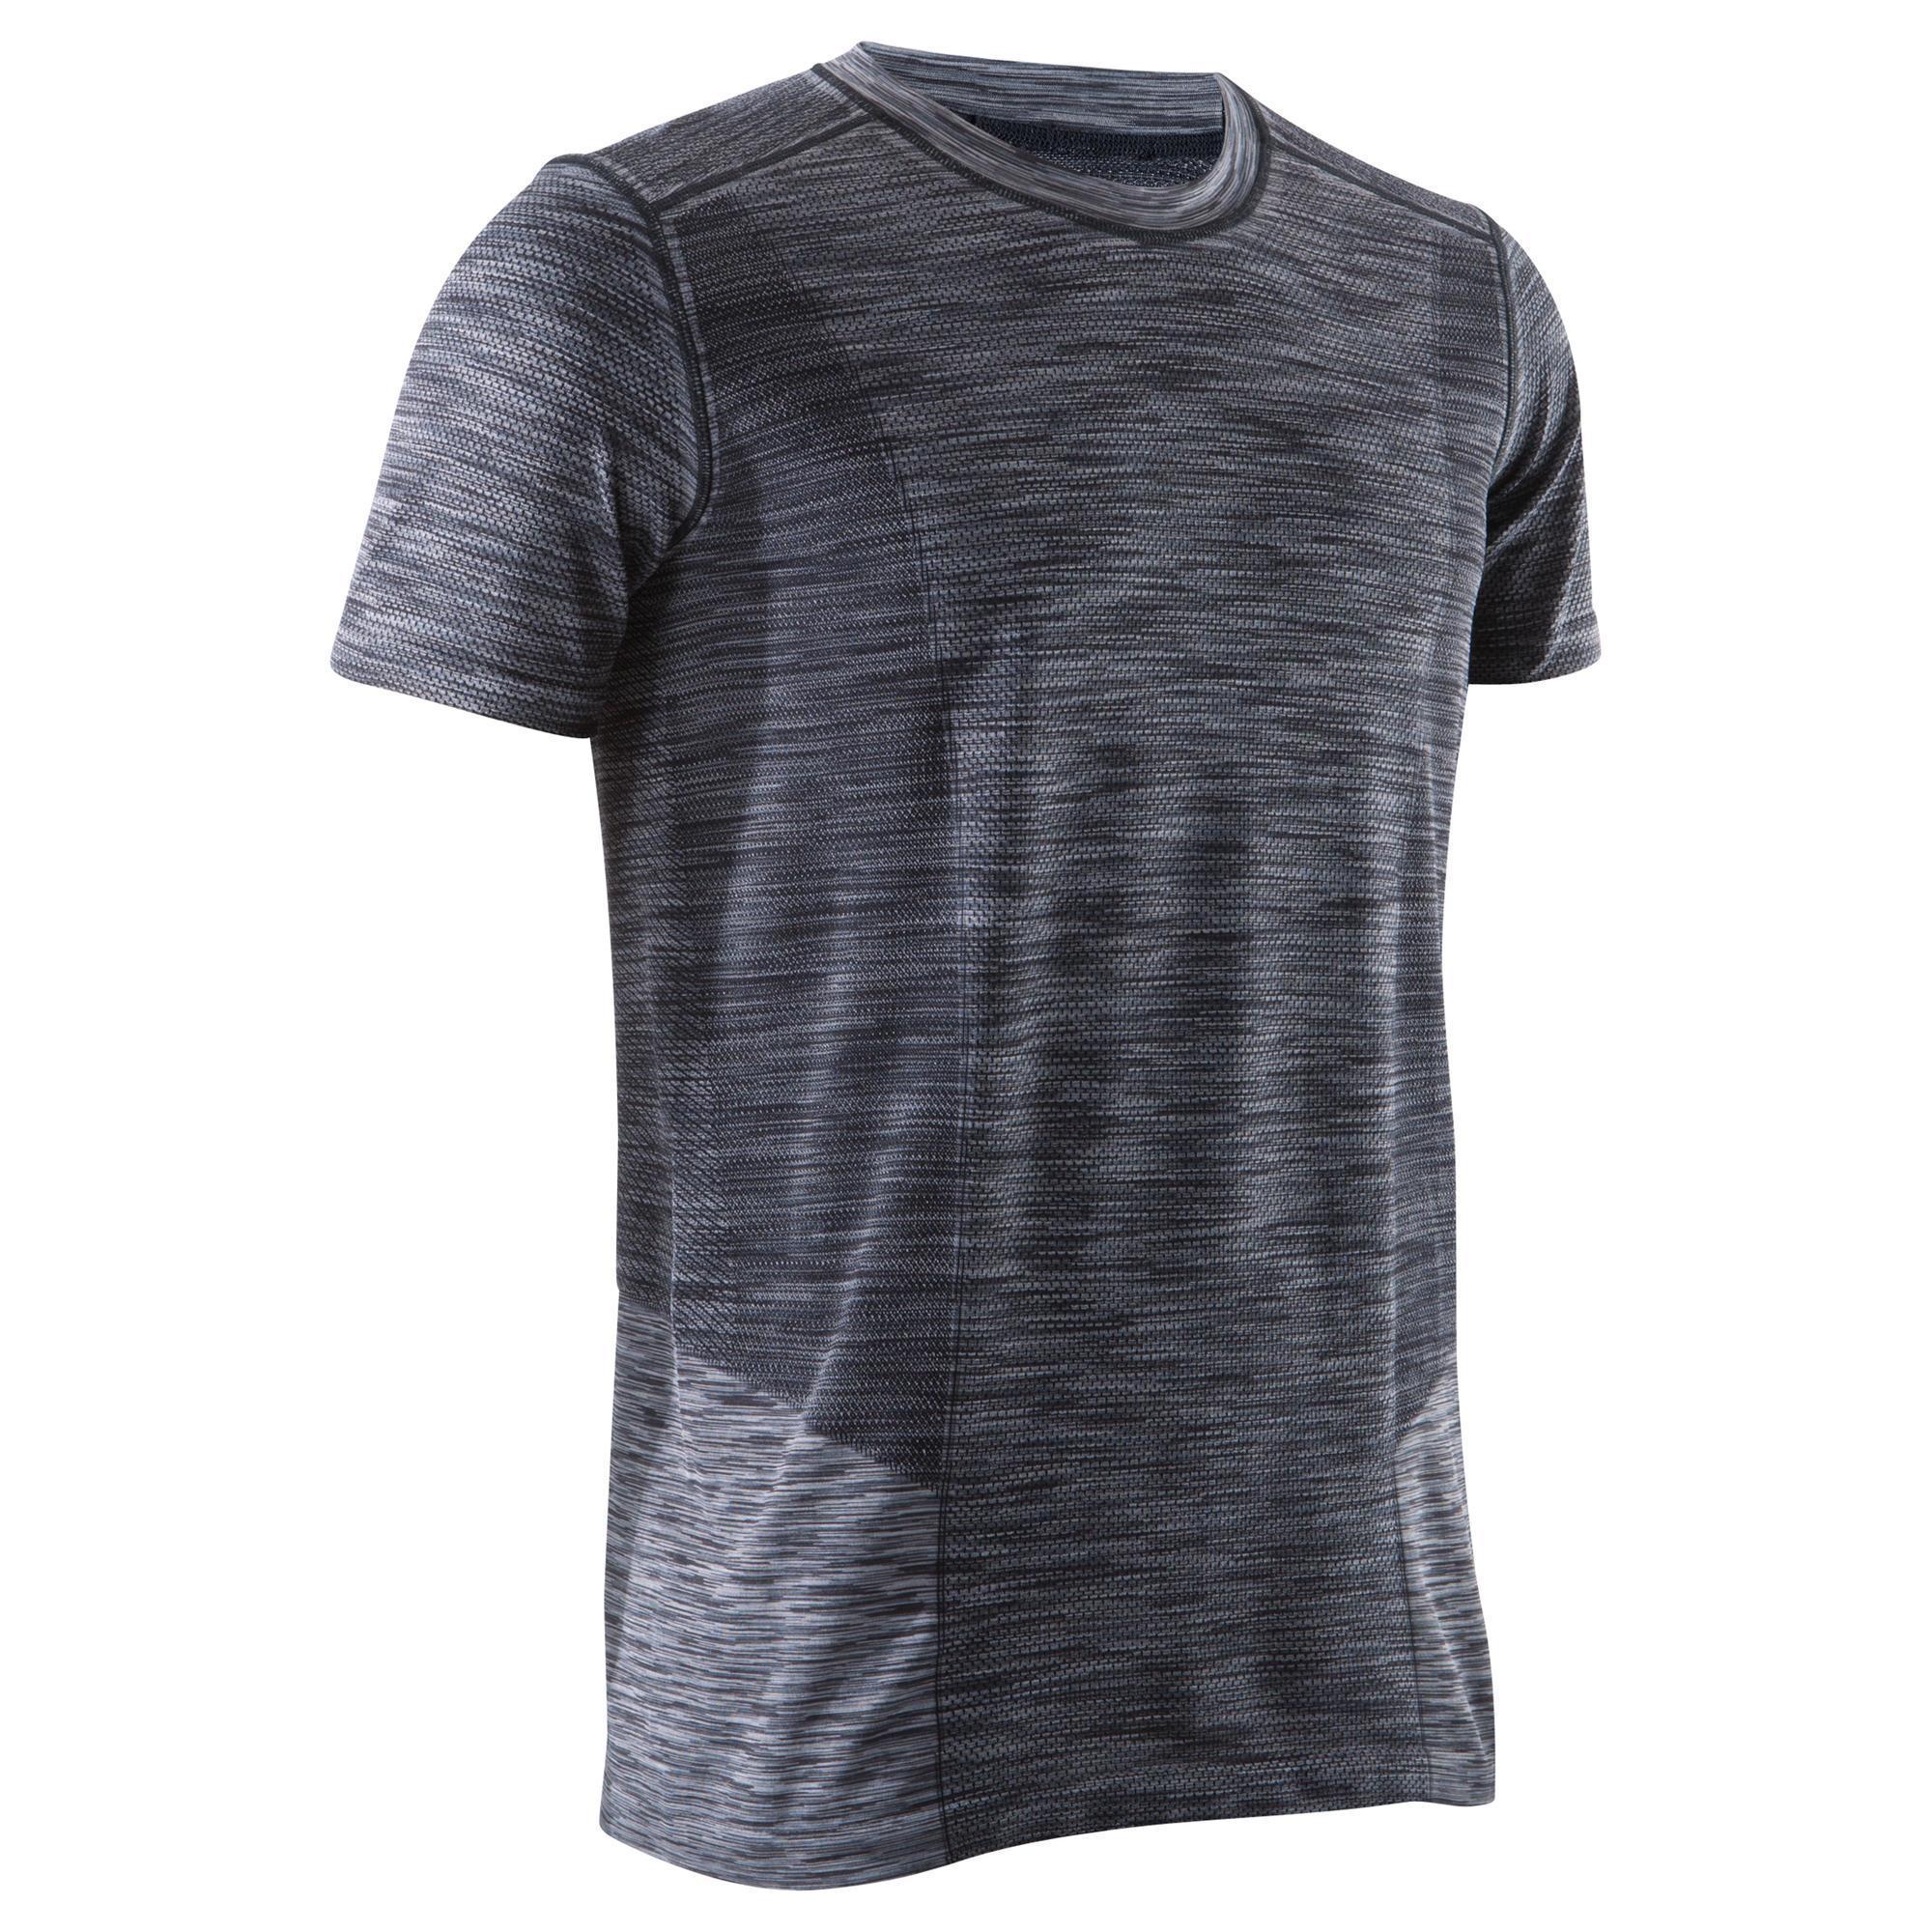 t shirt yoga sans coutures noir gris homme domyos by decathlon. Black Bedroom Furniture Sets. Home Design Ideas